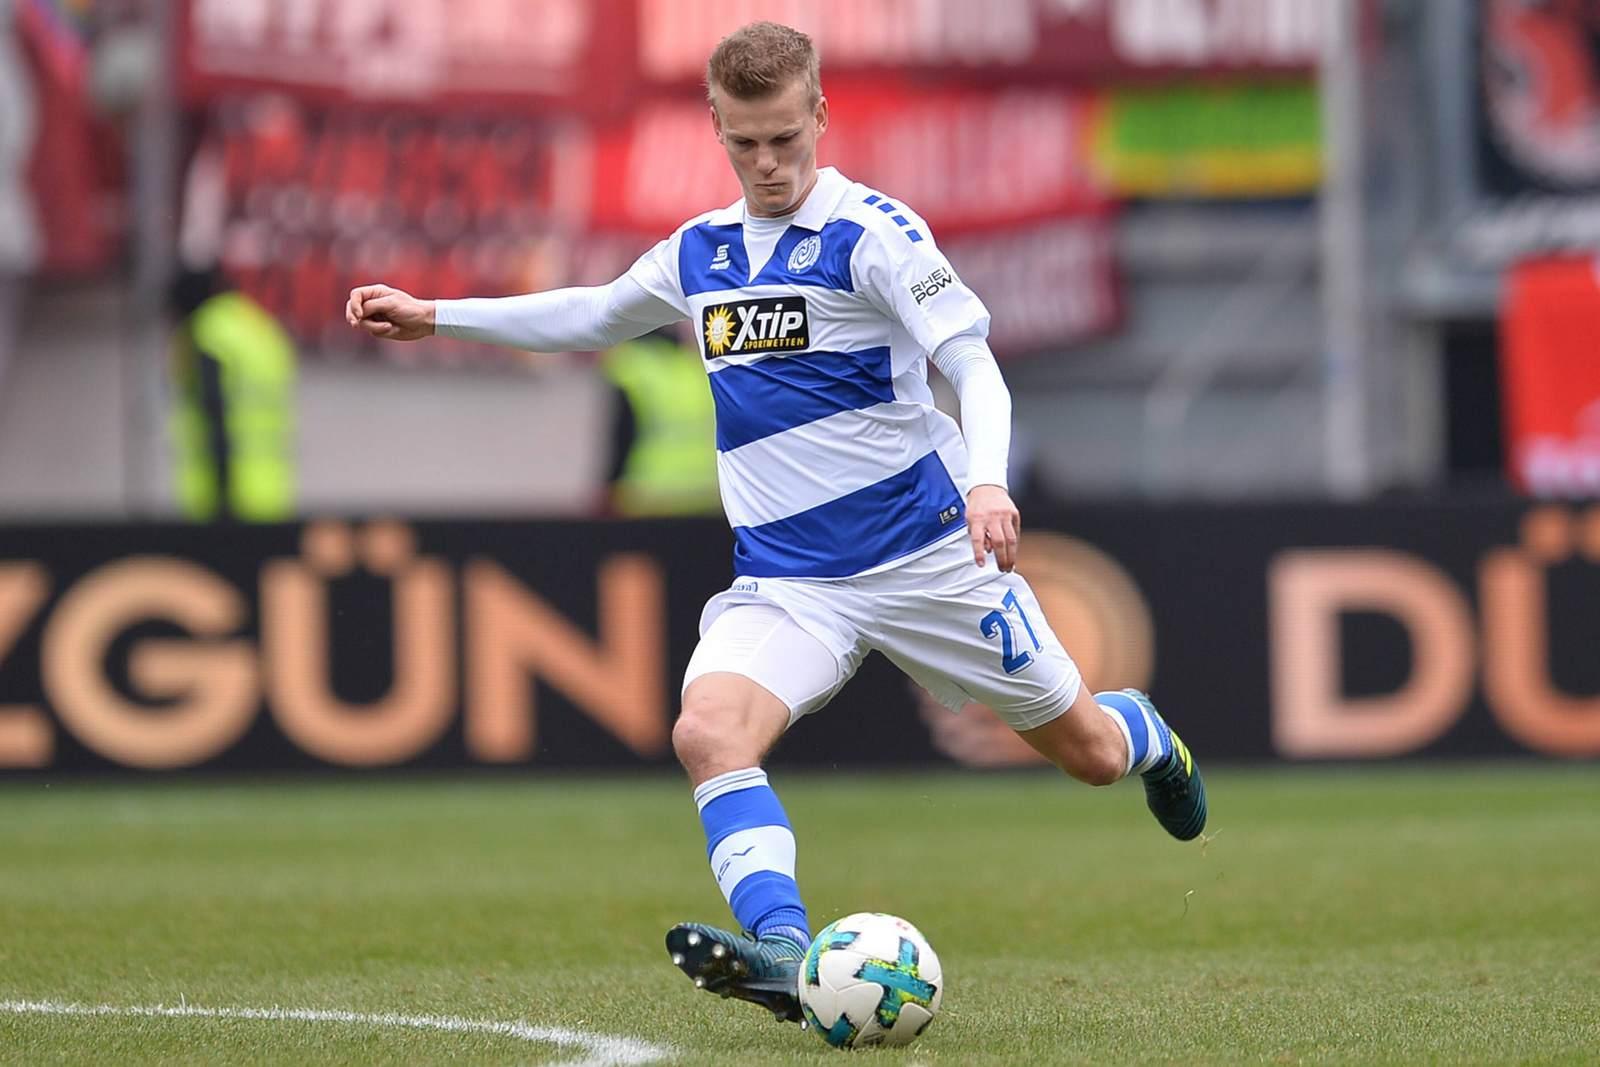 Dan-Patrick Poggenberg am Ball für den MSV Duisburg.